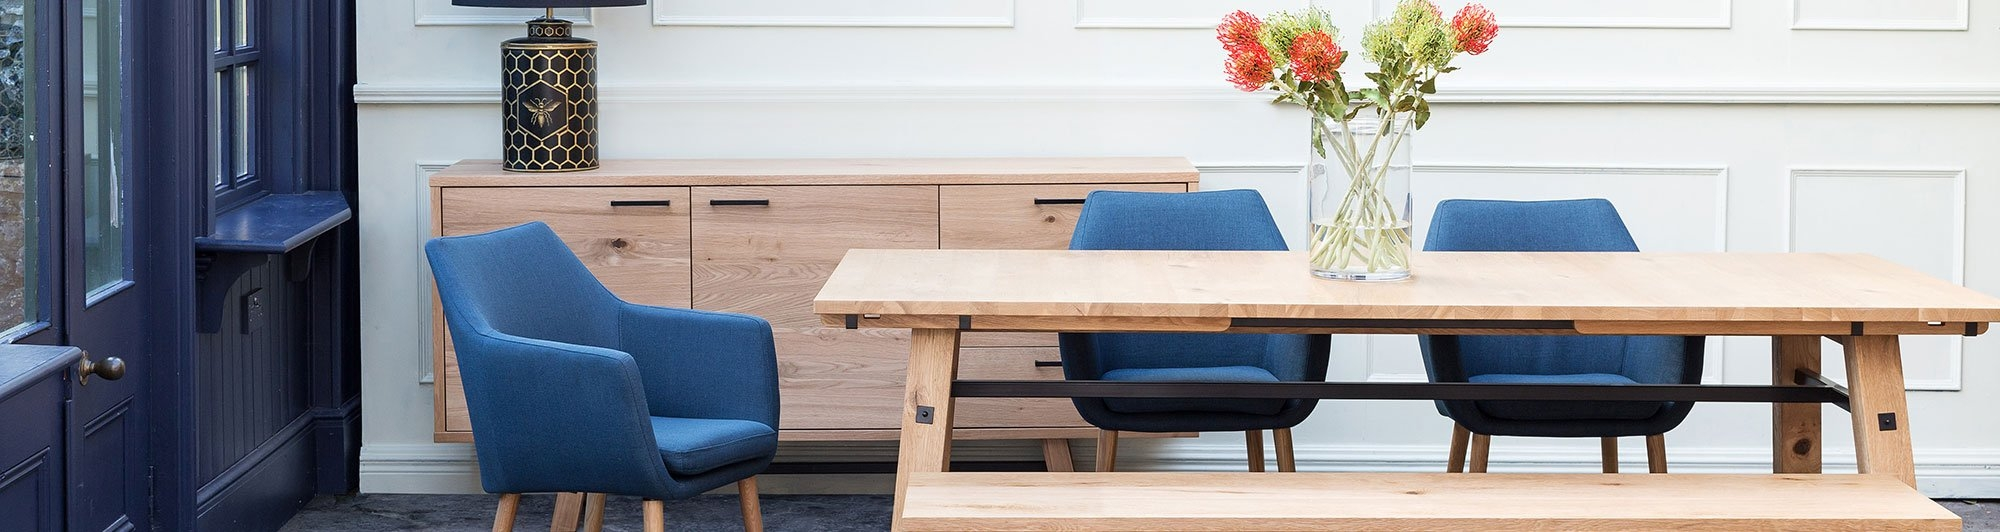 foto furniture. PrevNext Foto Furniture E